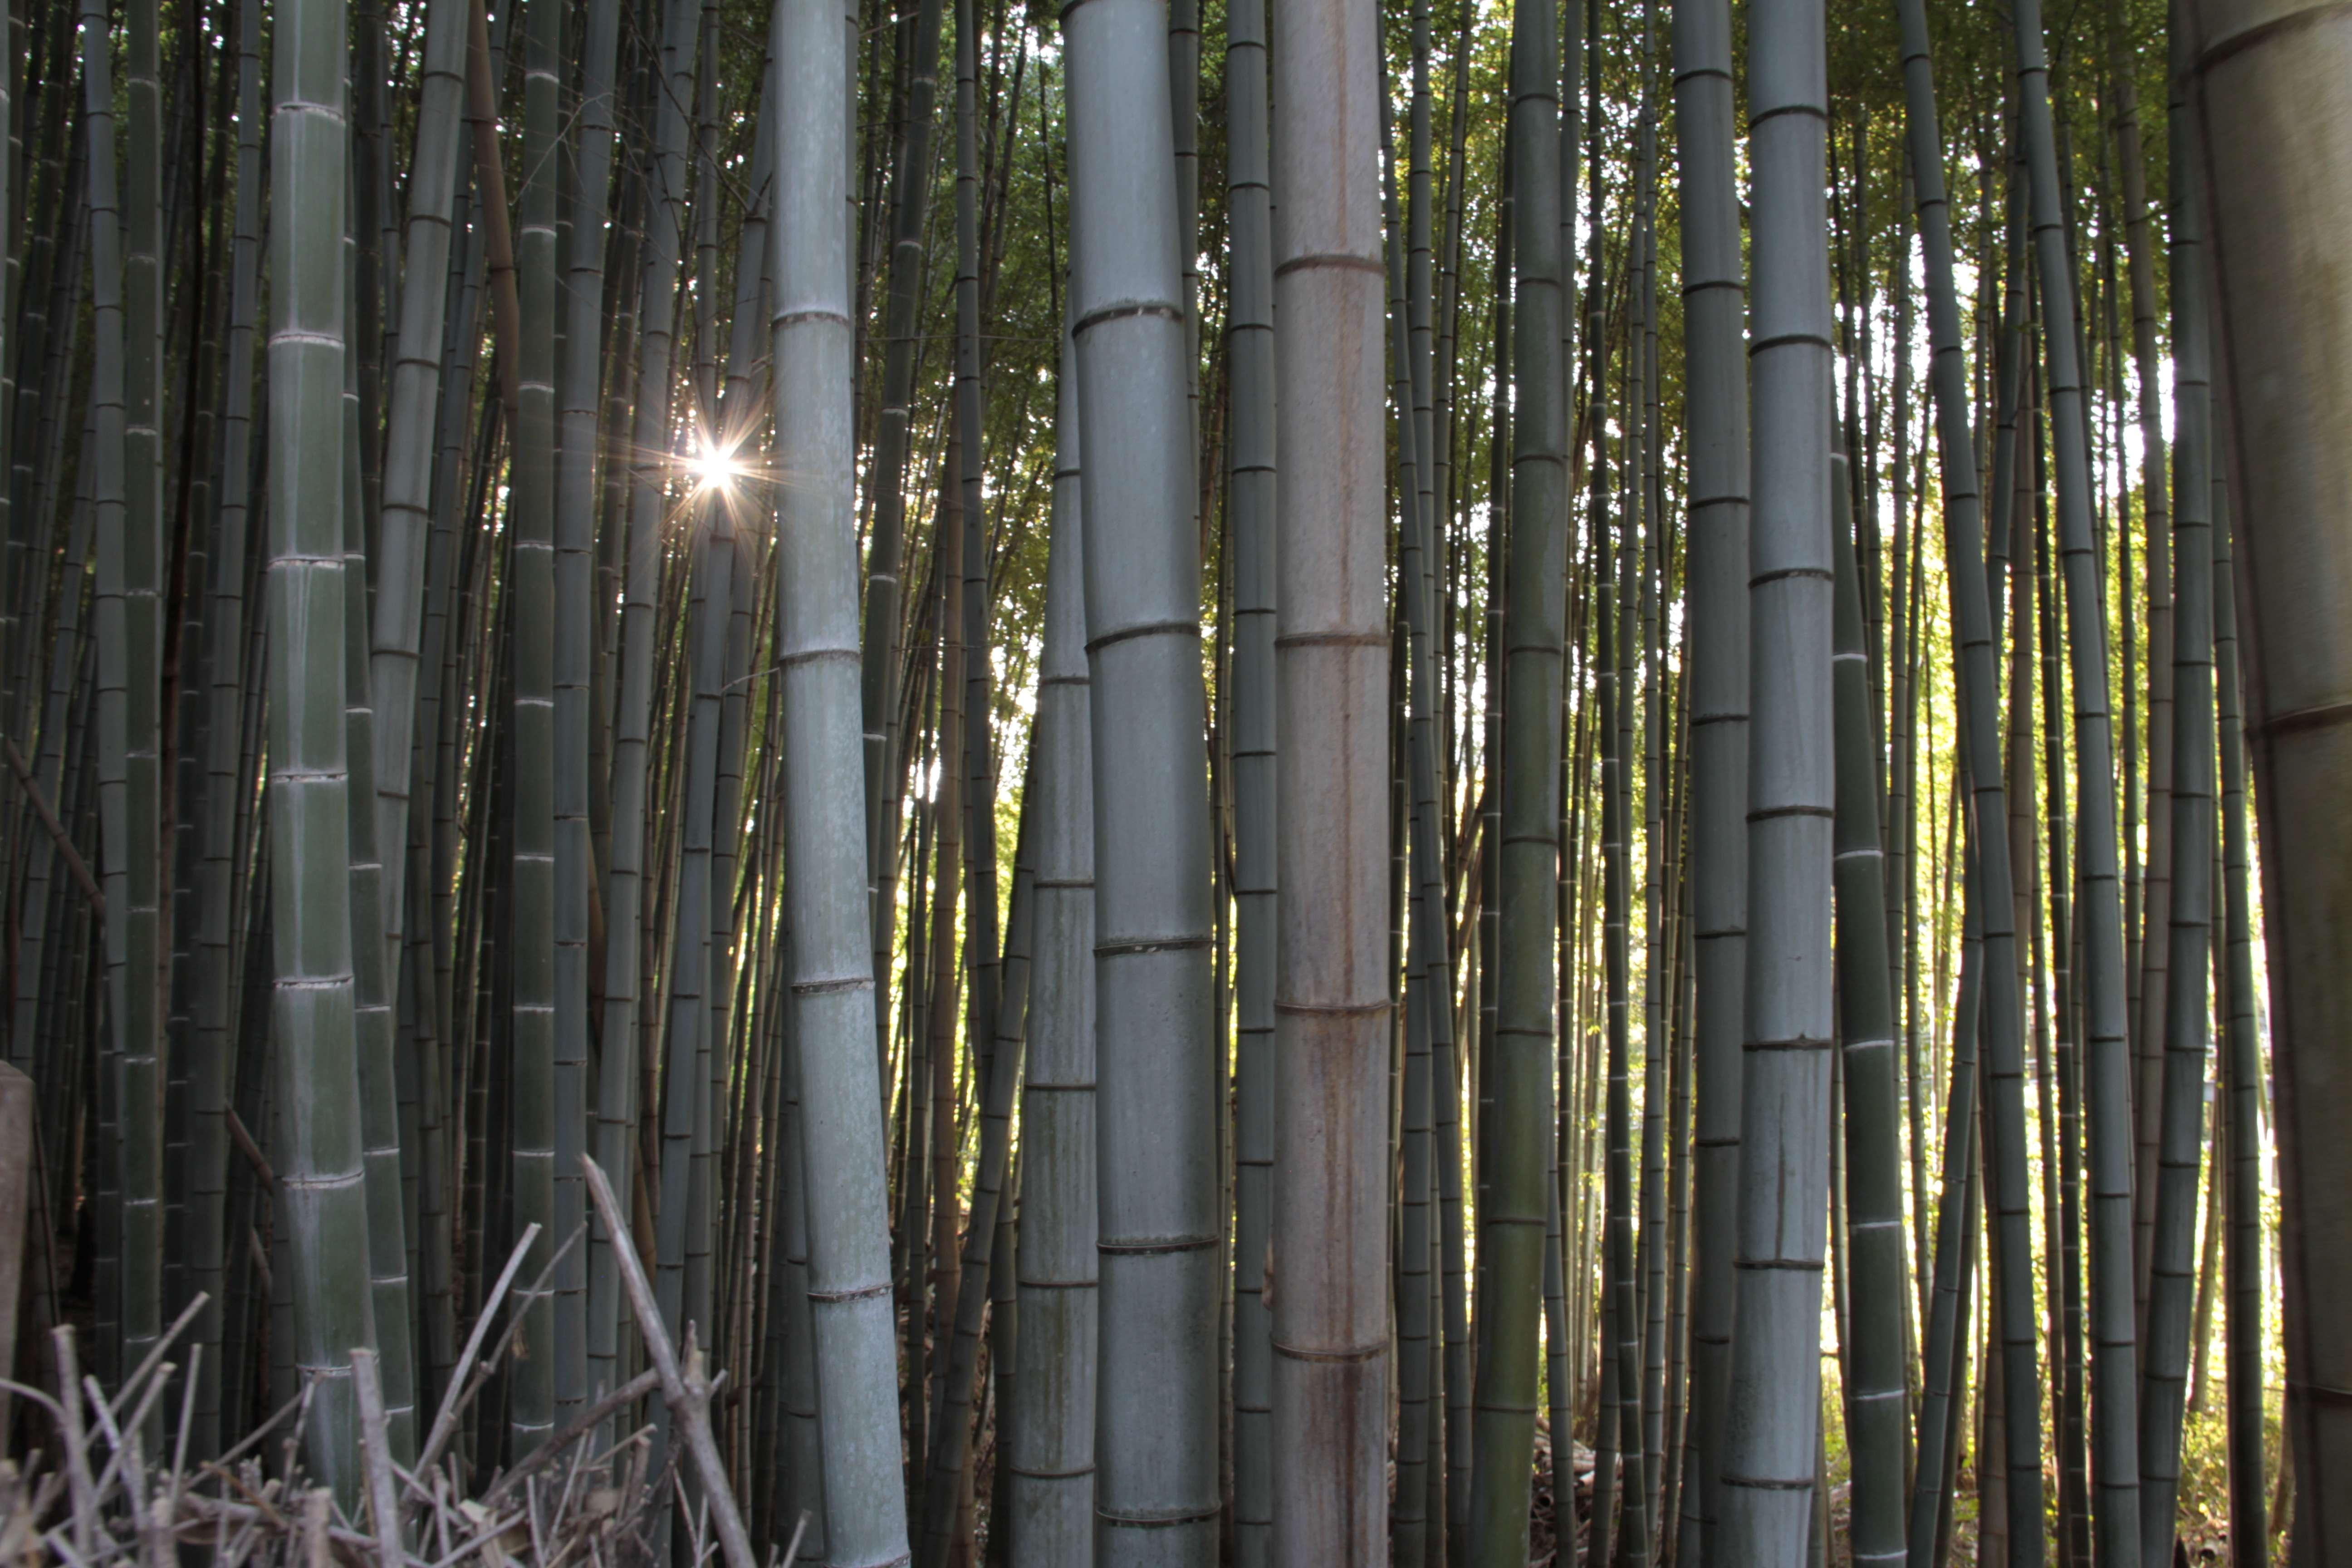 Japon avril 2017_0878 Kyoto bambouseraie d Arashiyama